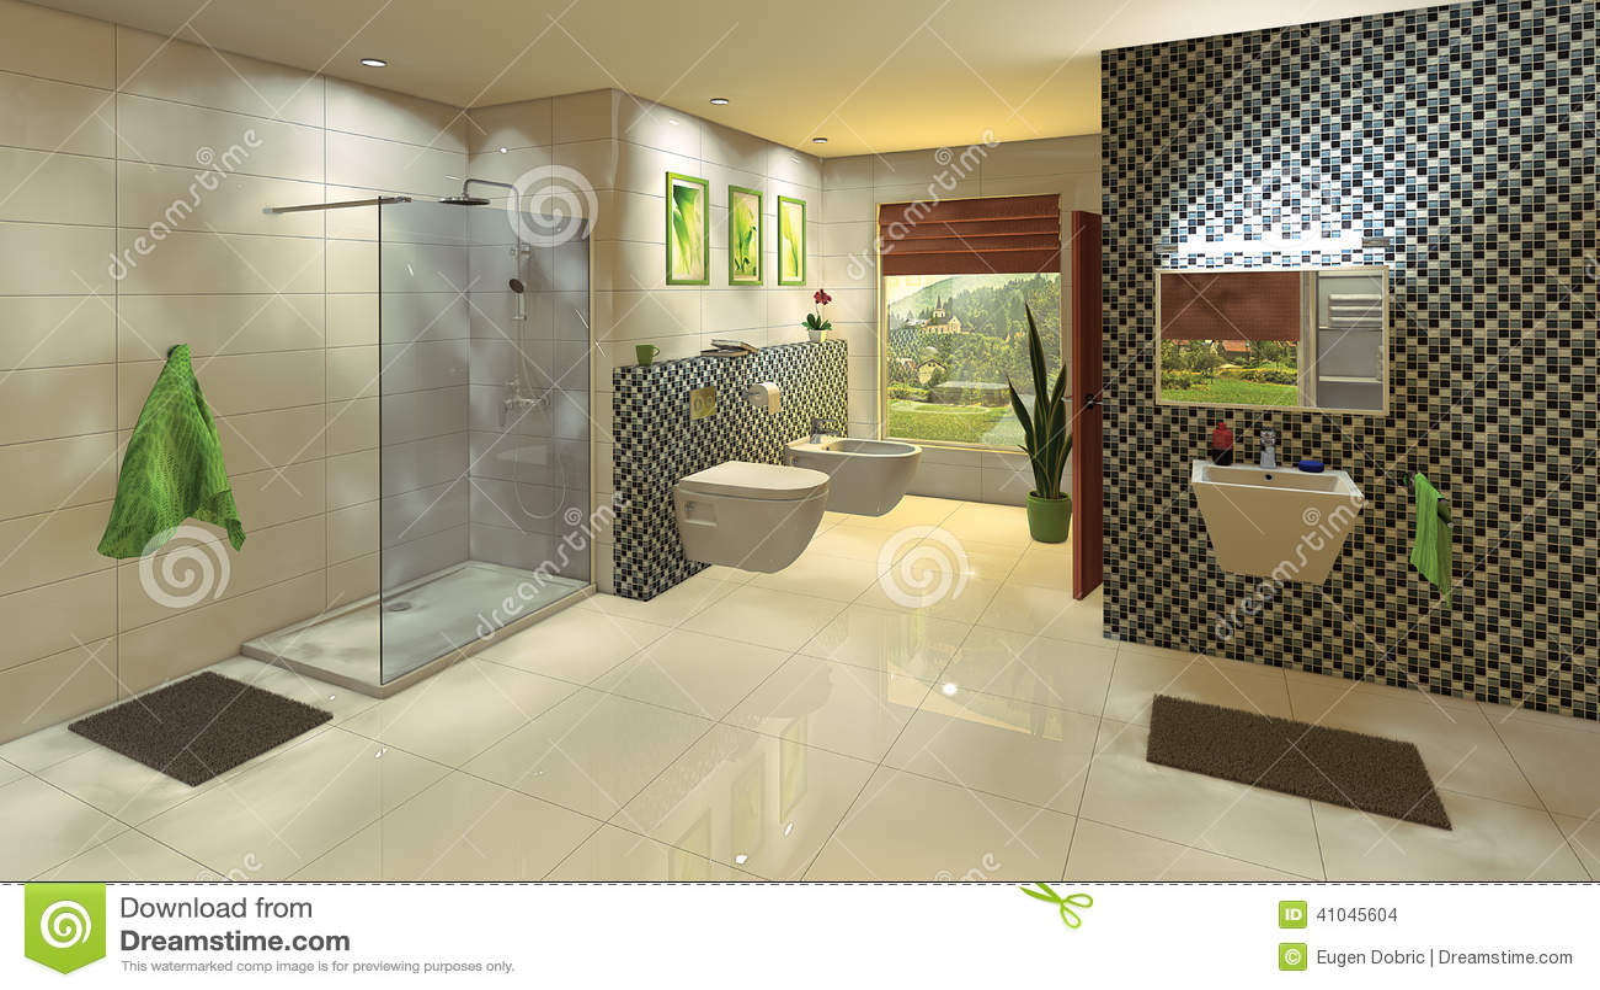 Salle De Bains Avec Mur De Mosa Que 3d Model Download Free 3d Models ...